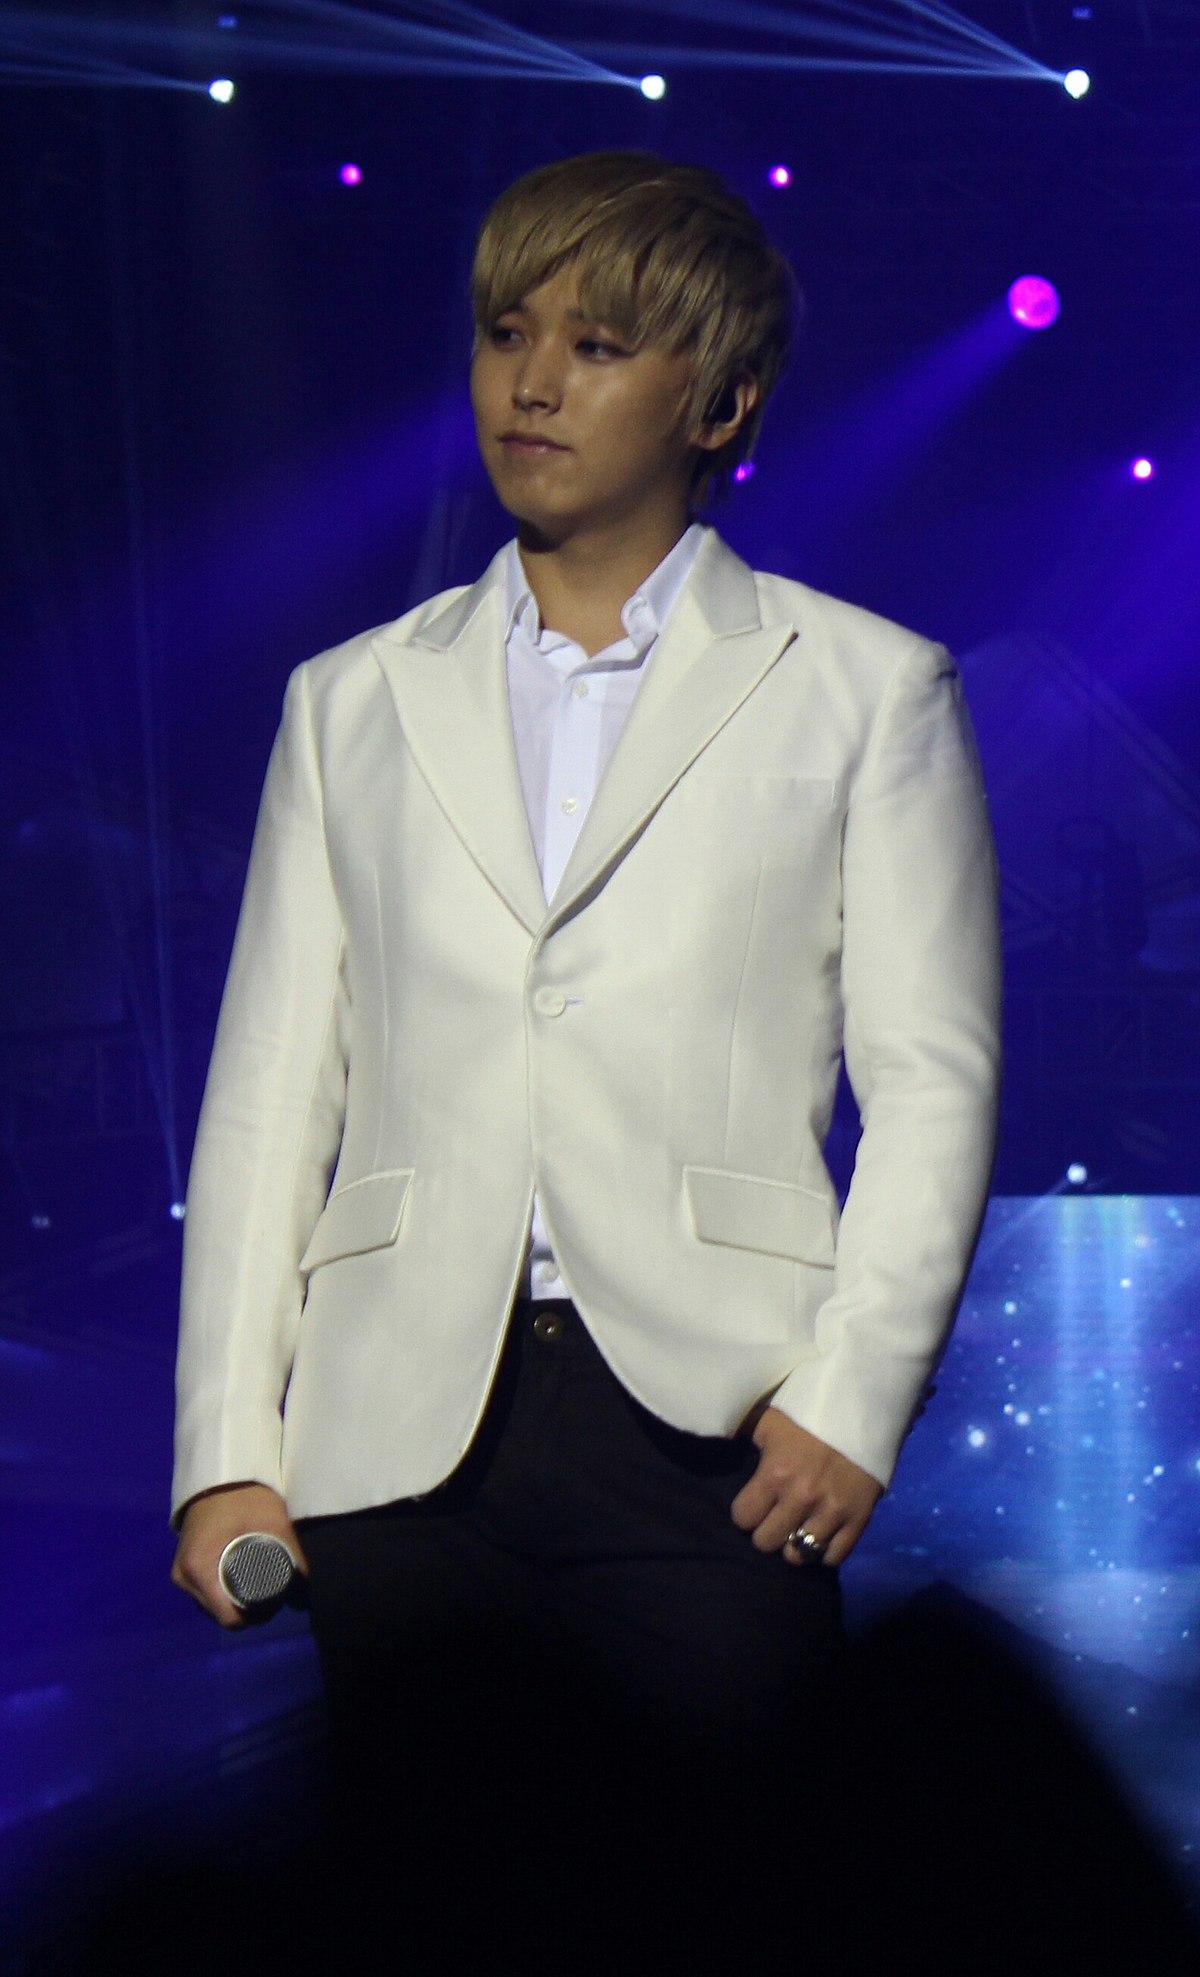 Lee Sung-min (cantante) - Lee Sung-min (singer) - qaz.wiki